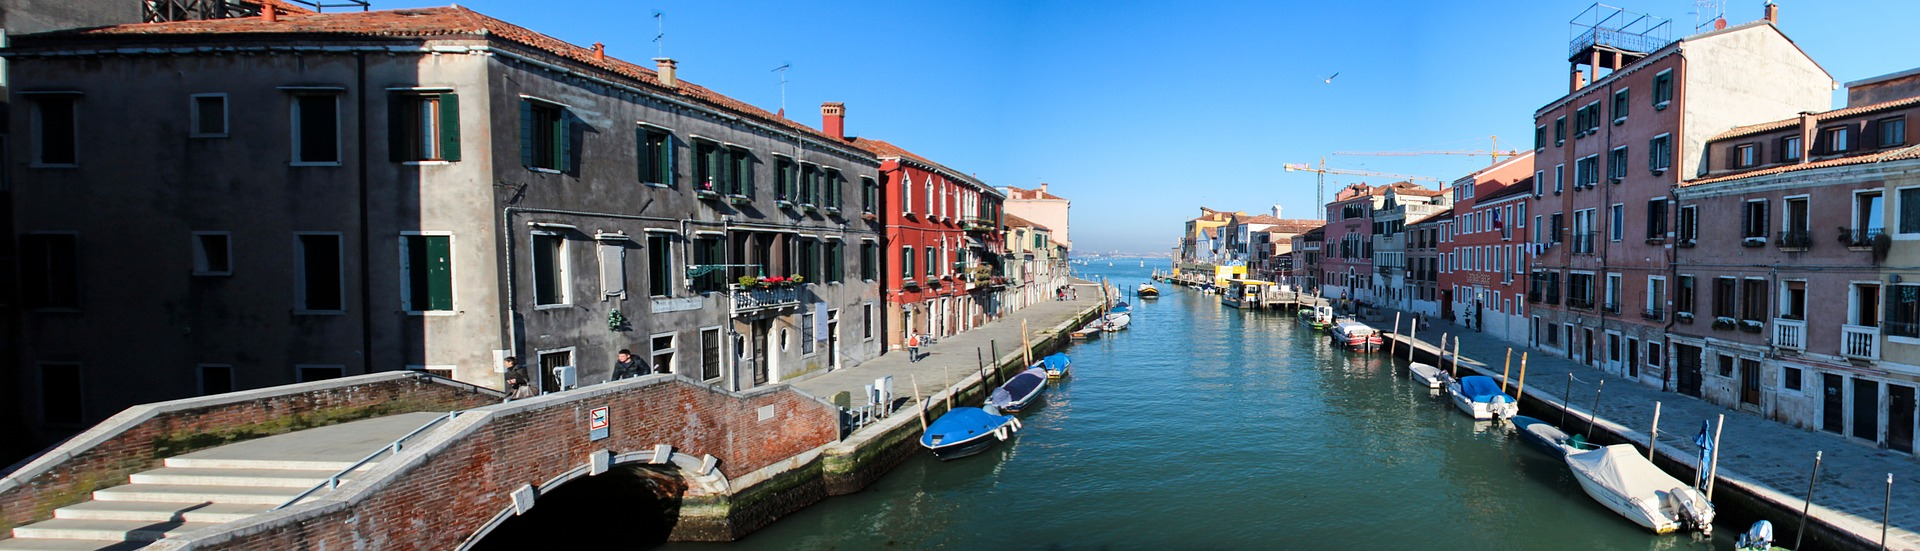 venise-italie-voyage-grv